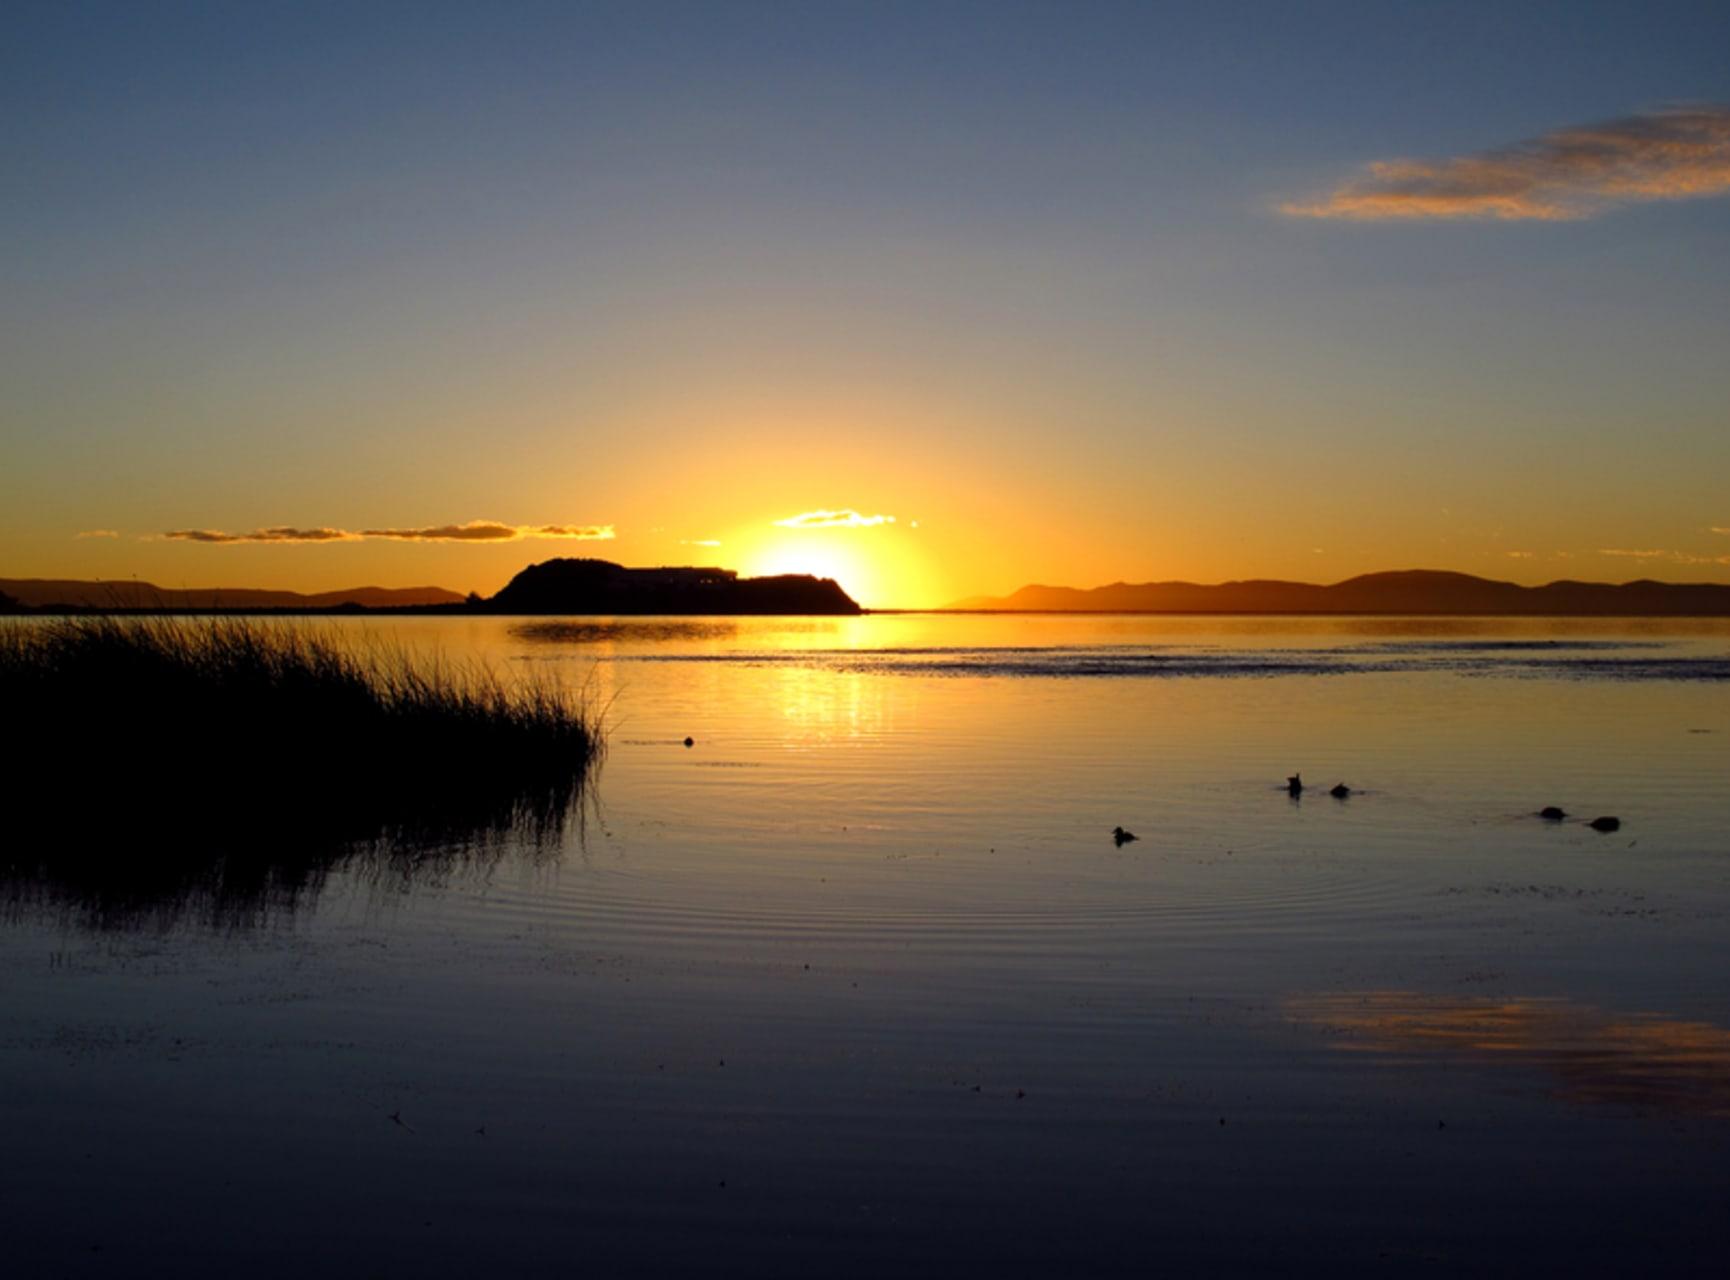 Puno - Sunrise Over the City and Titi Kaka Lake